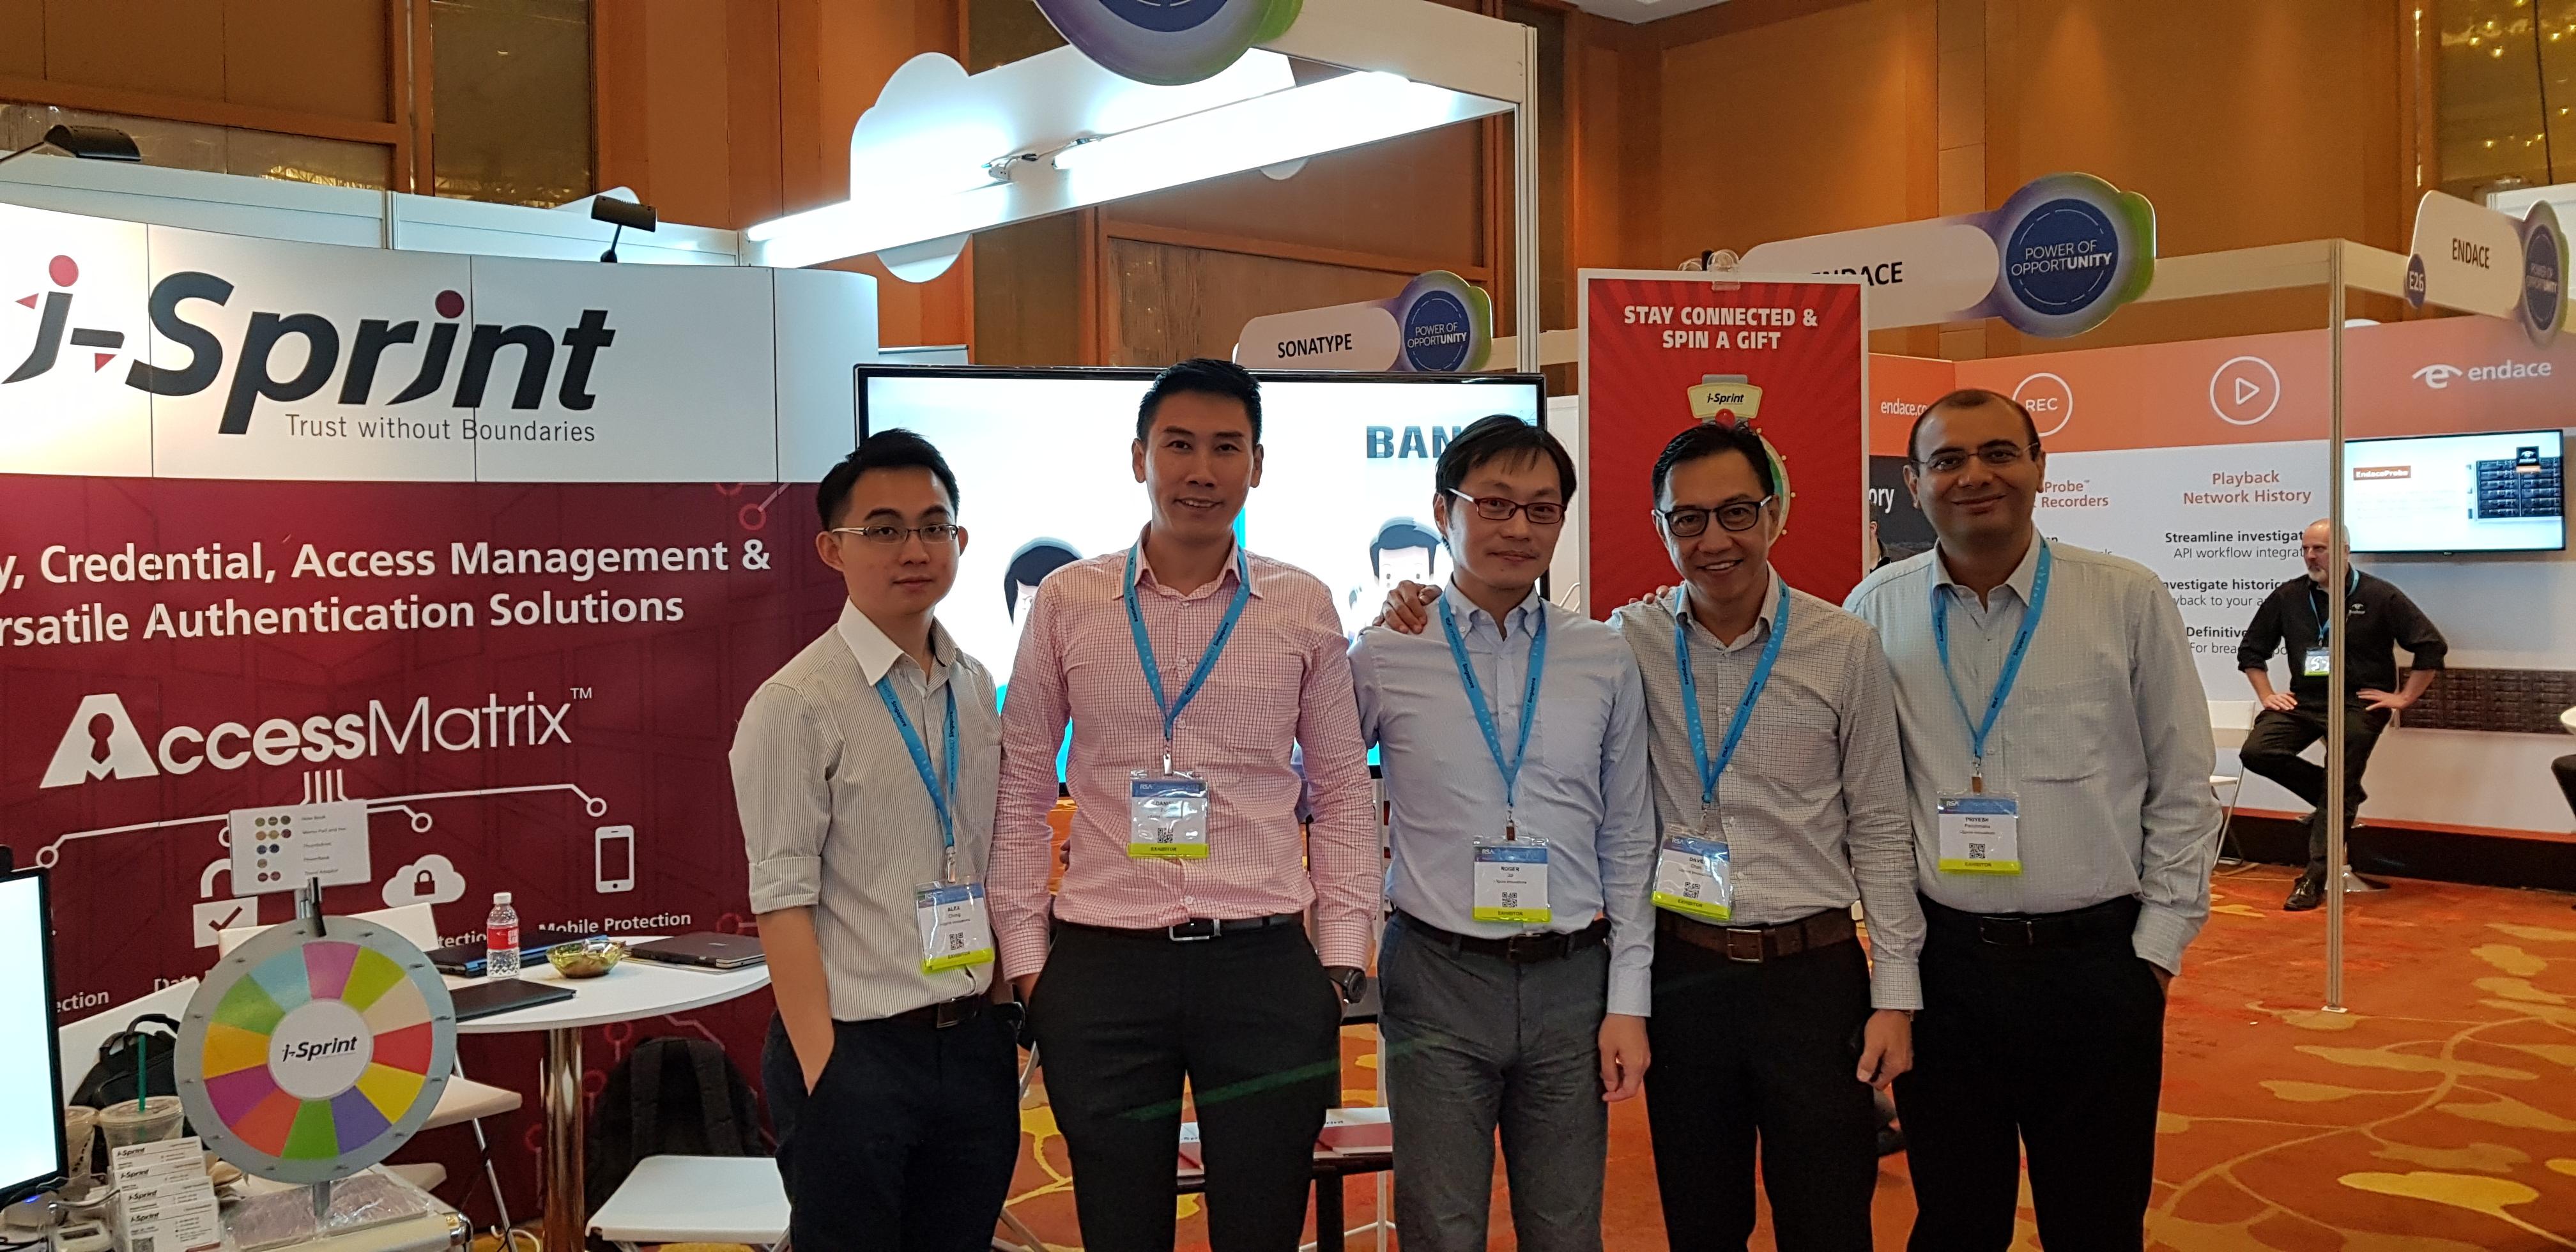 i-Sprint RSA 2017 Conference Group Photo